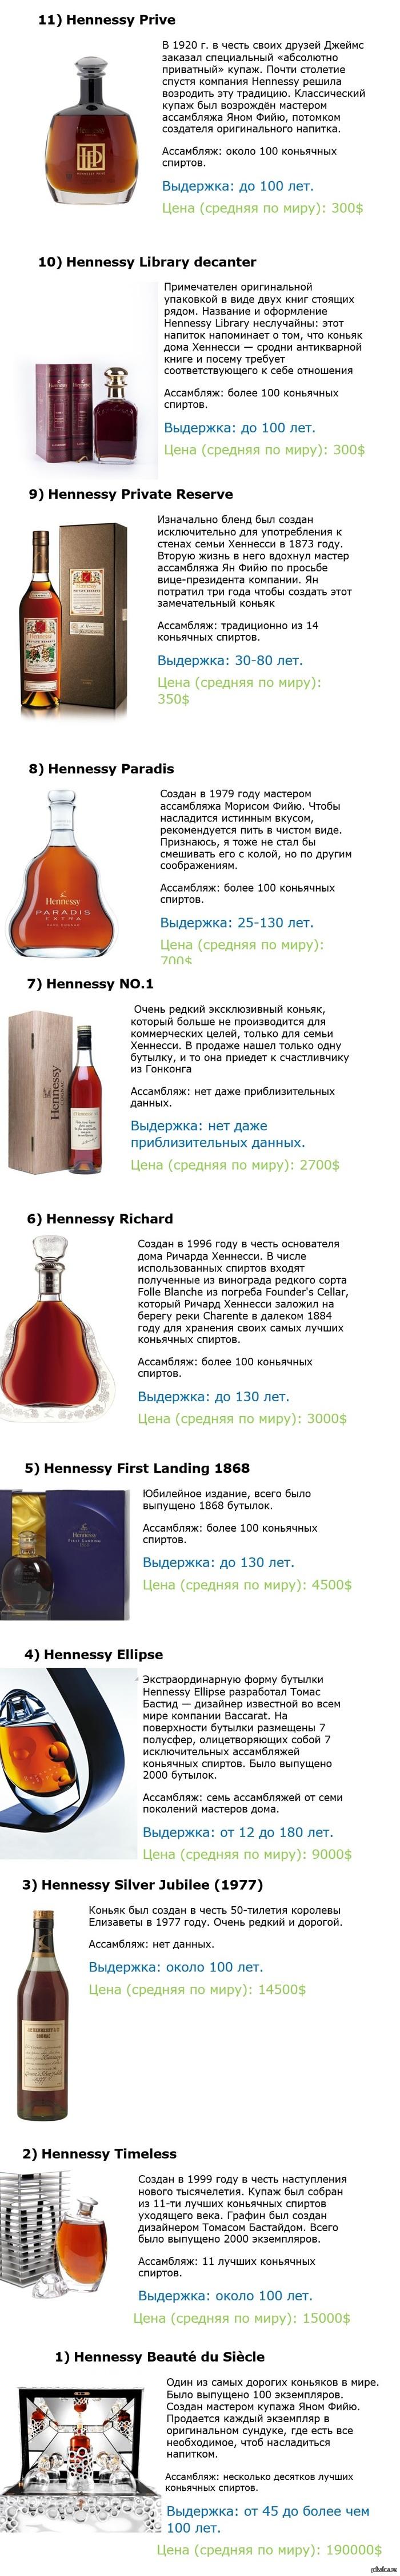 "Топ коньяков Hennessy. ЧАСТЬ 2-я: ""Как за день пропить квартиру"" 1-я часть: http://pikabu.ru/story/top_konyakov_hennessy_chast_1ya_quotdlya_smertnyikhquot_1198864"